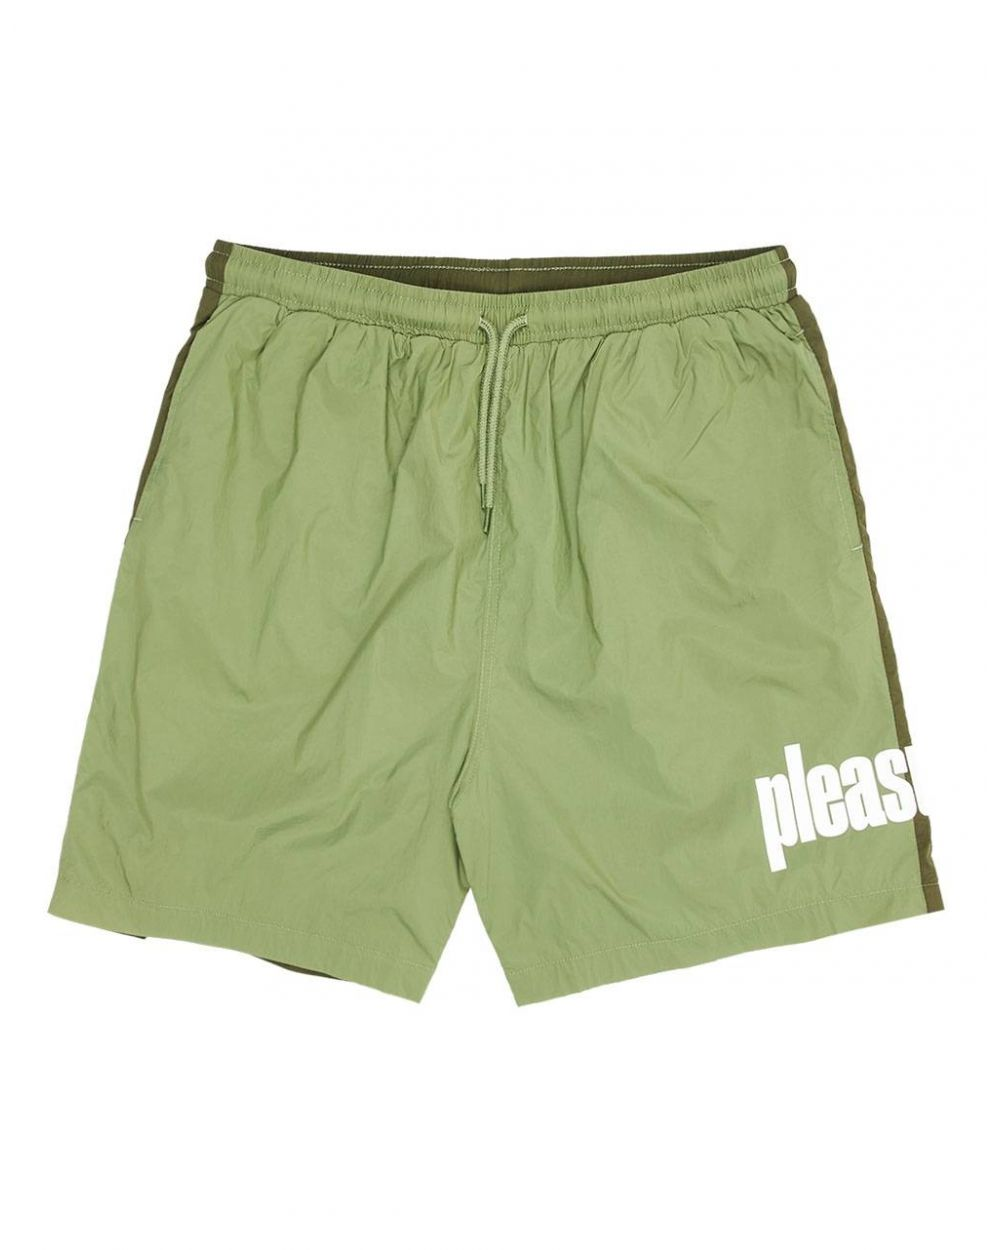 Pleasures Active shorts - electric green Pleasures Shorts 89,00€